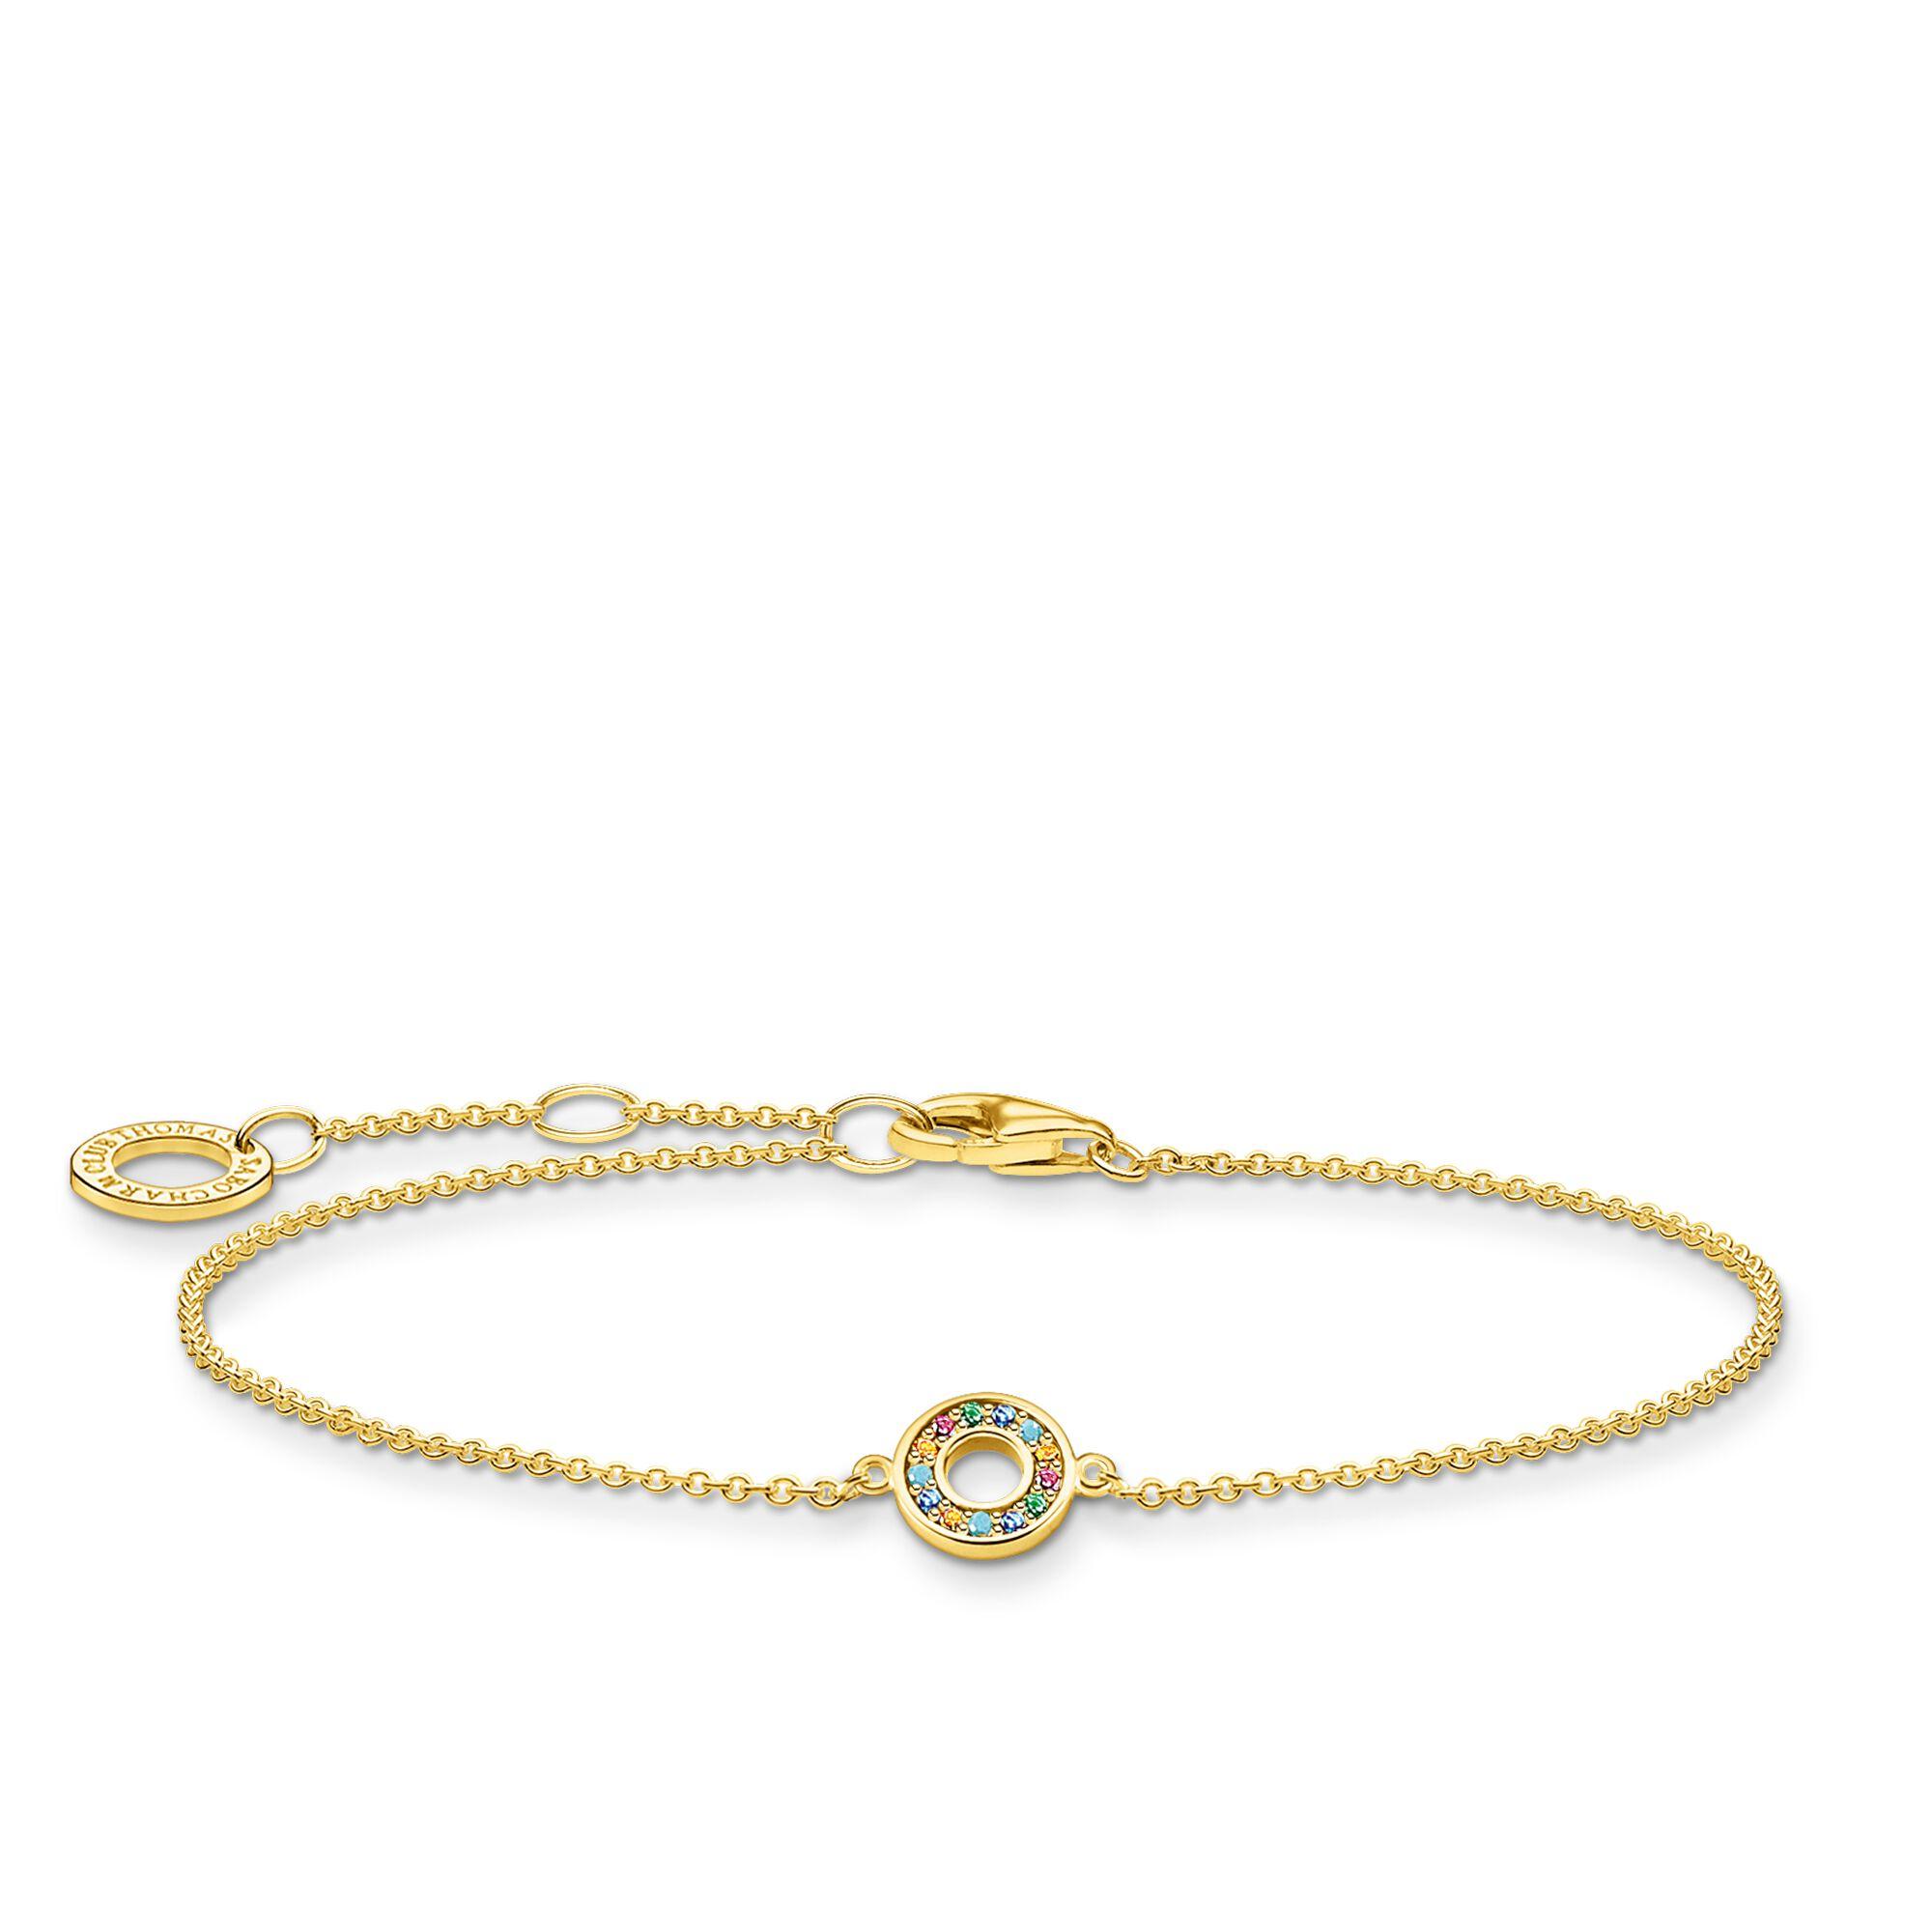 Wholesale Customized Fine yellow-gold plating OEM/ODM Jewelry chain bracelet with round glass-ceramic stone